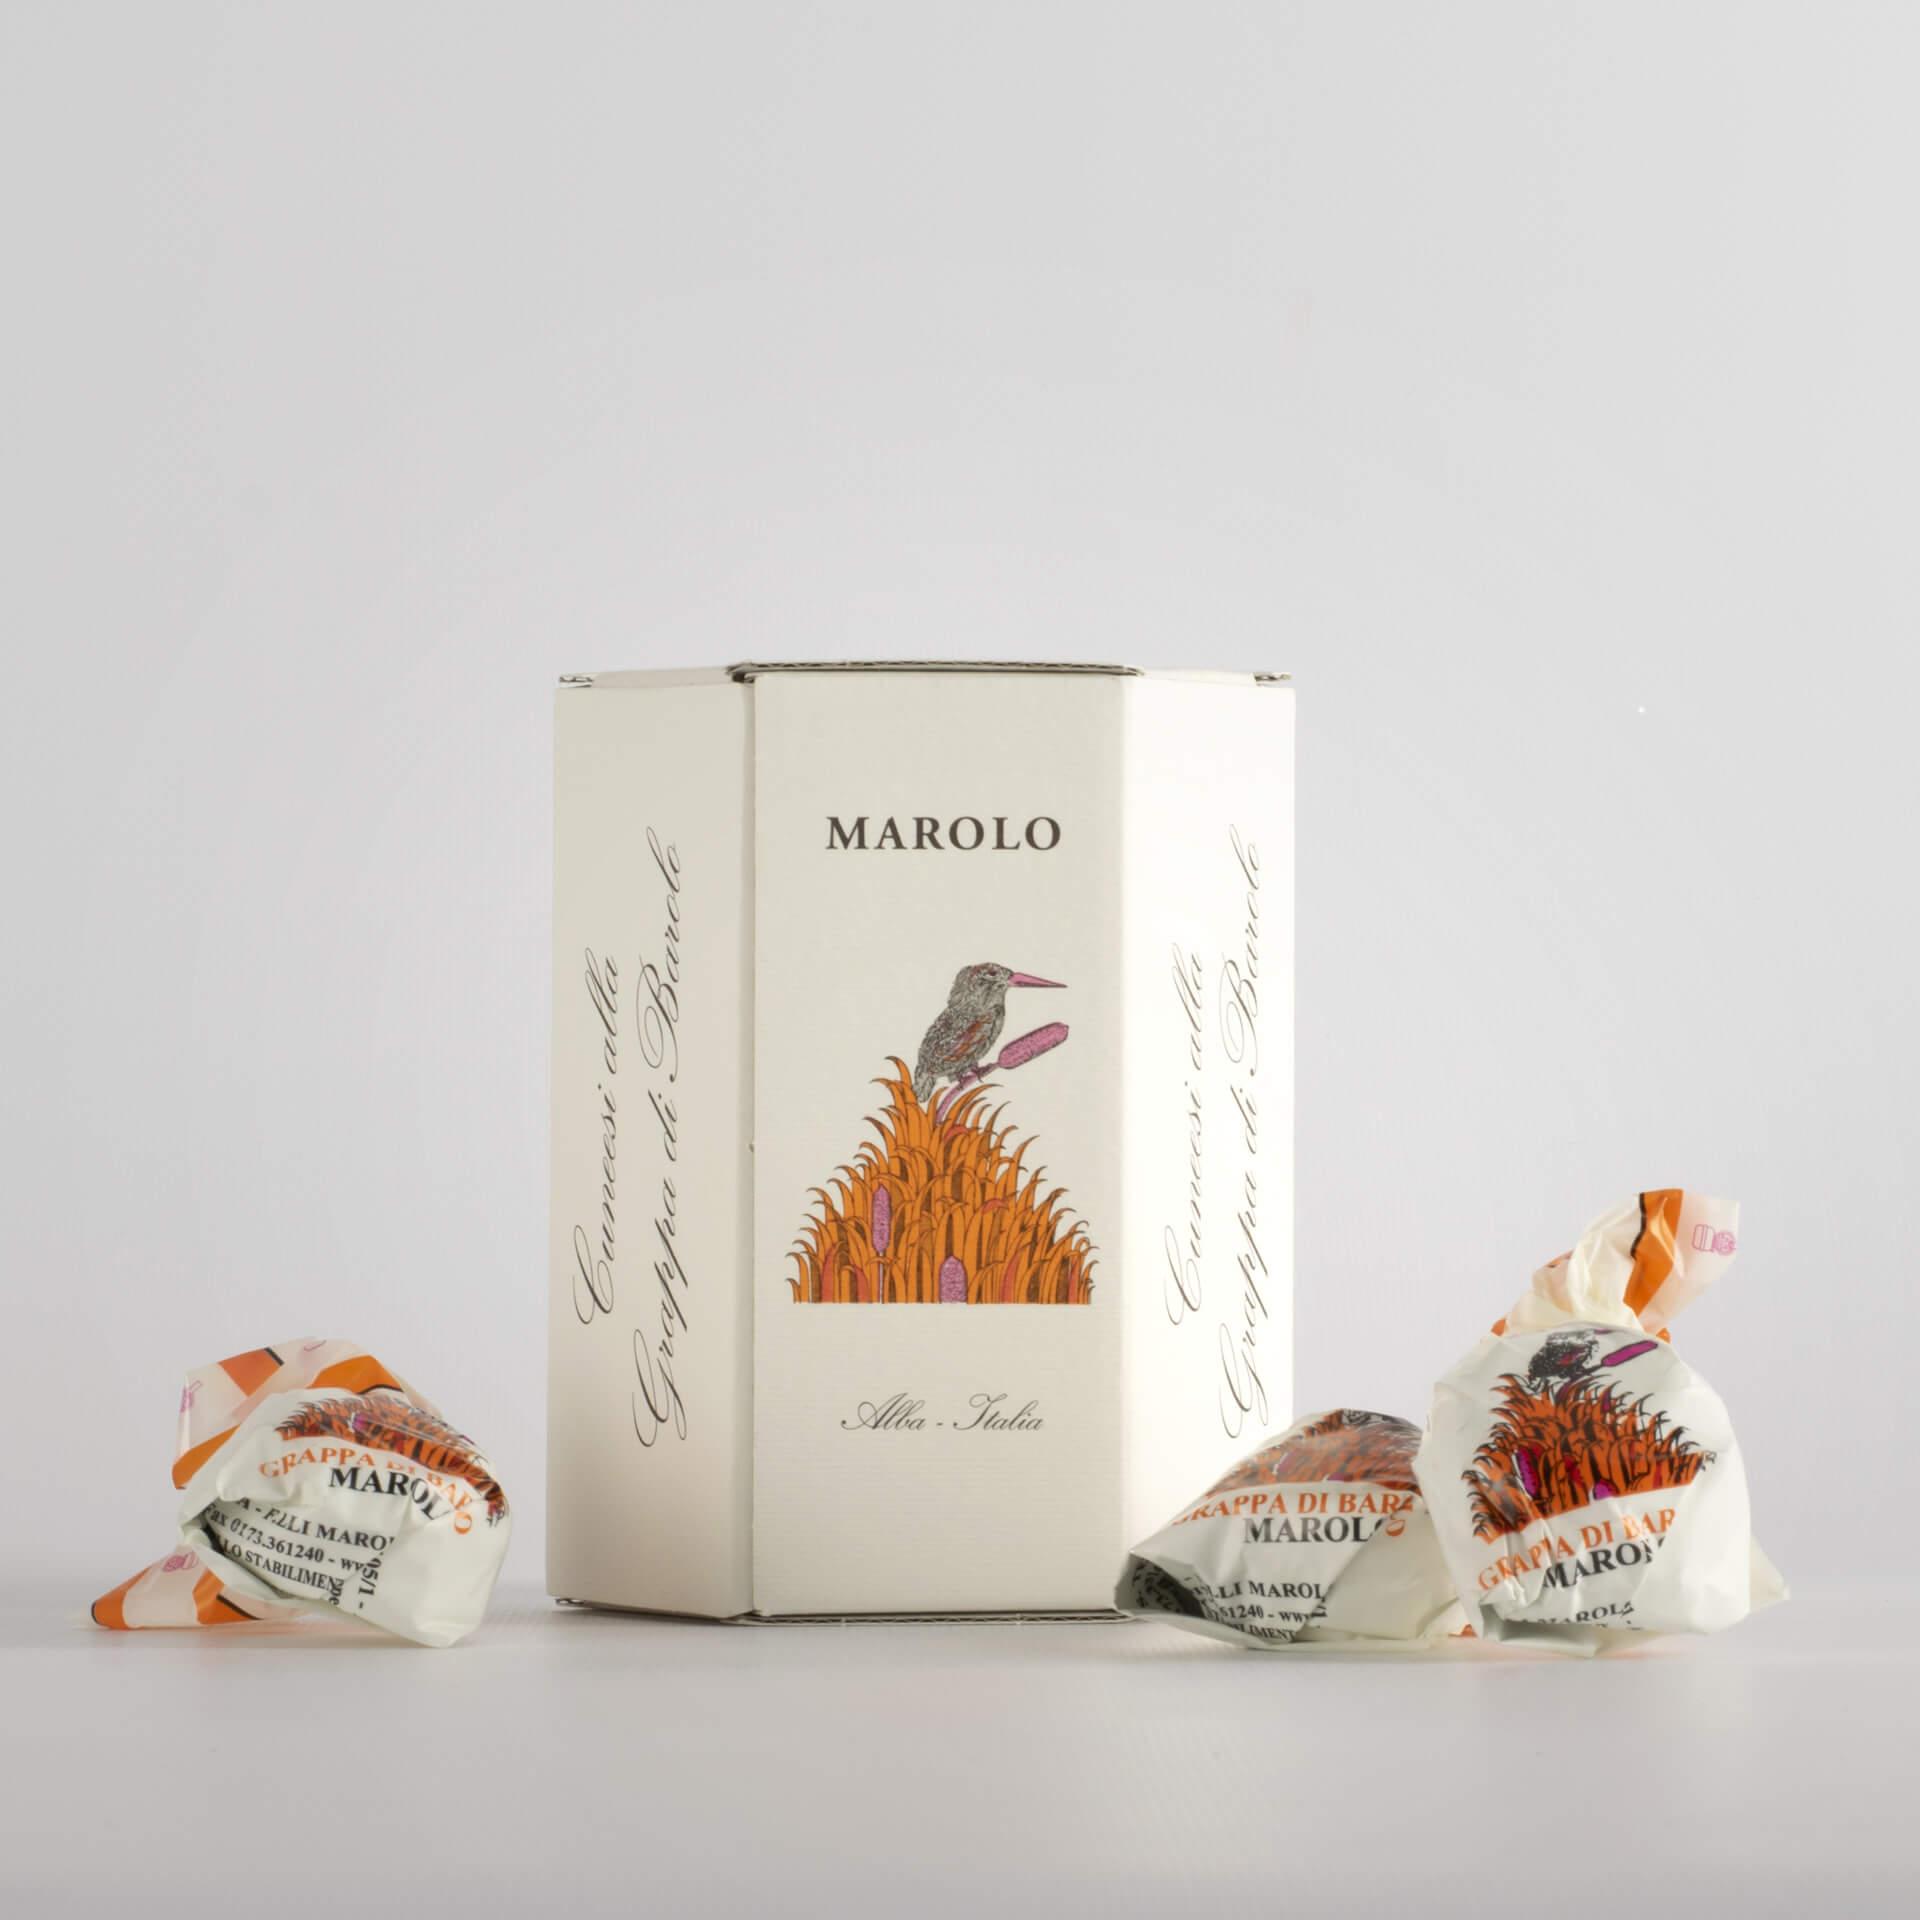 Barolo Grappa Cuneesi pralines - box 200 g